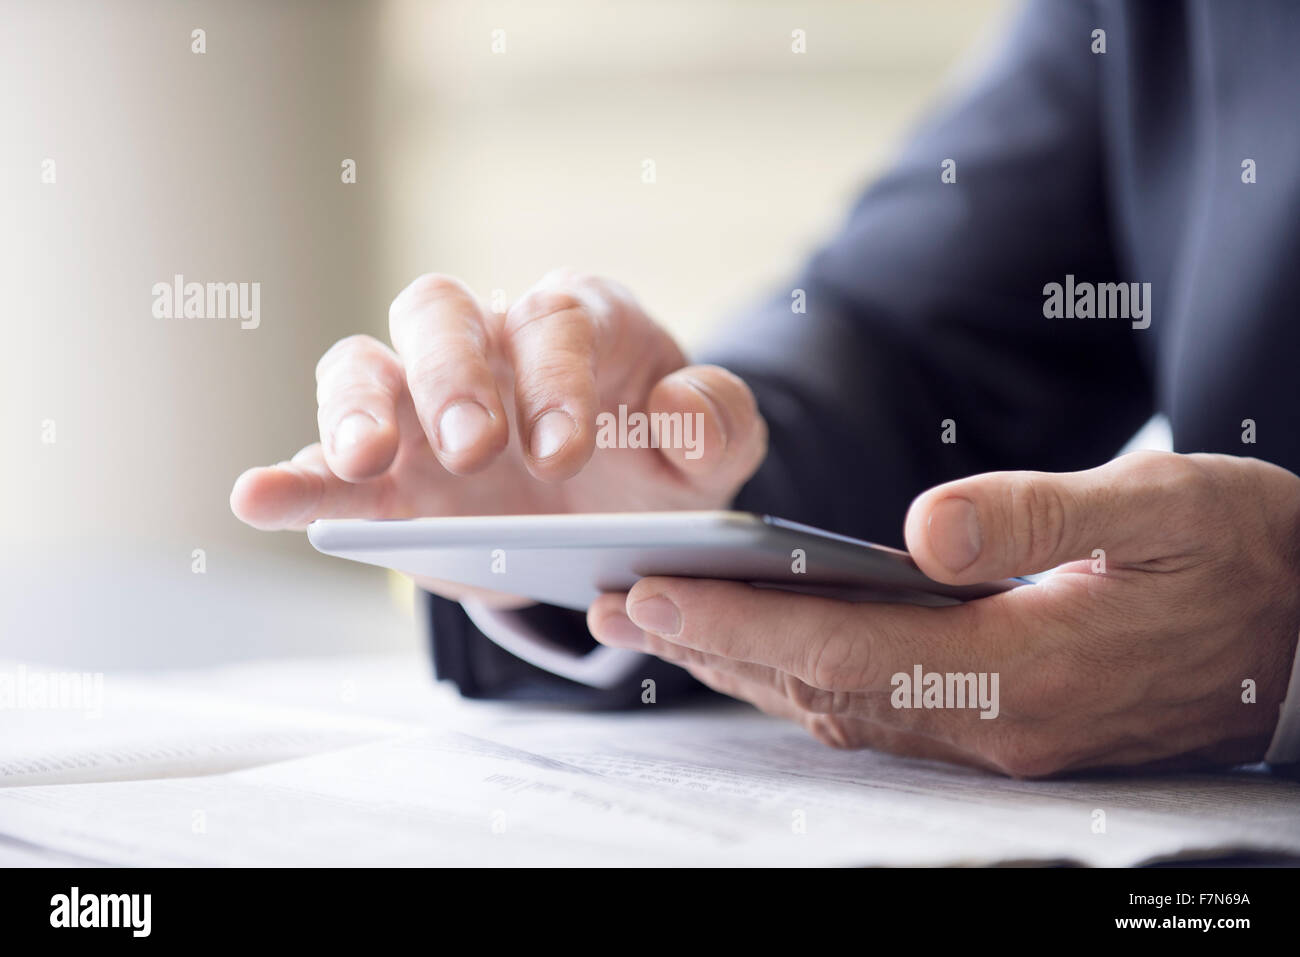 Mediante tableta digital Imagen De Stock